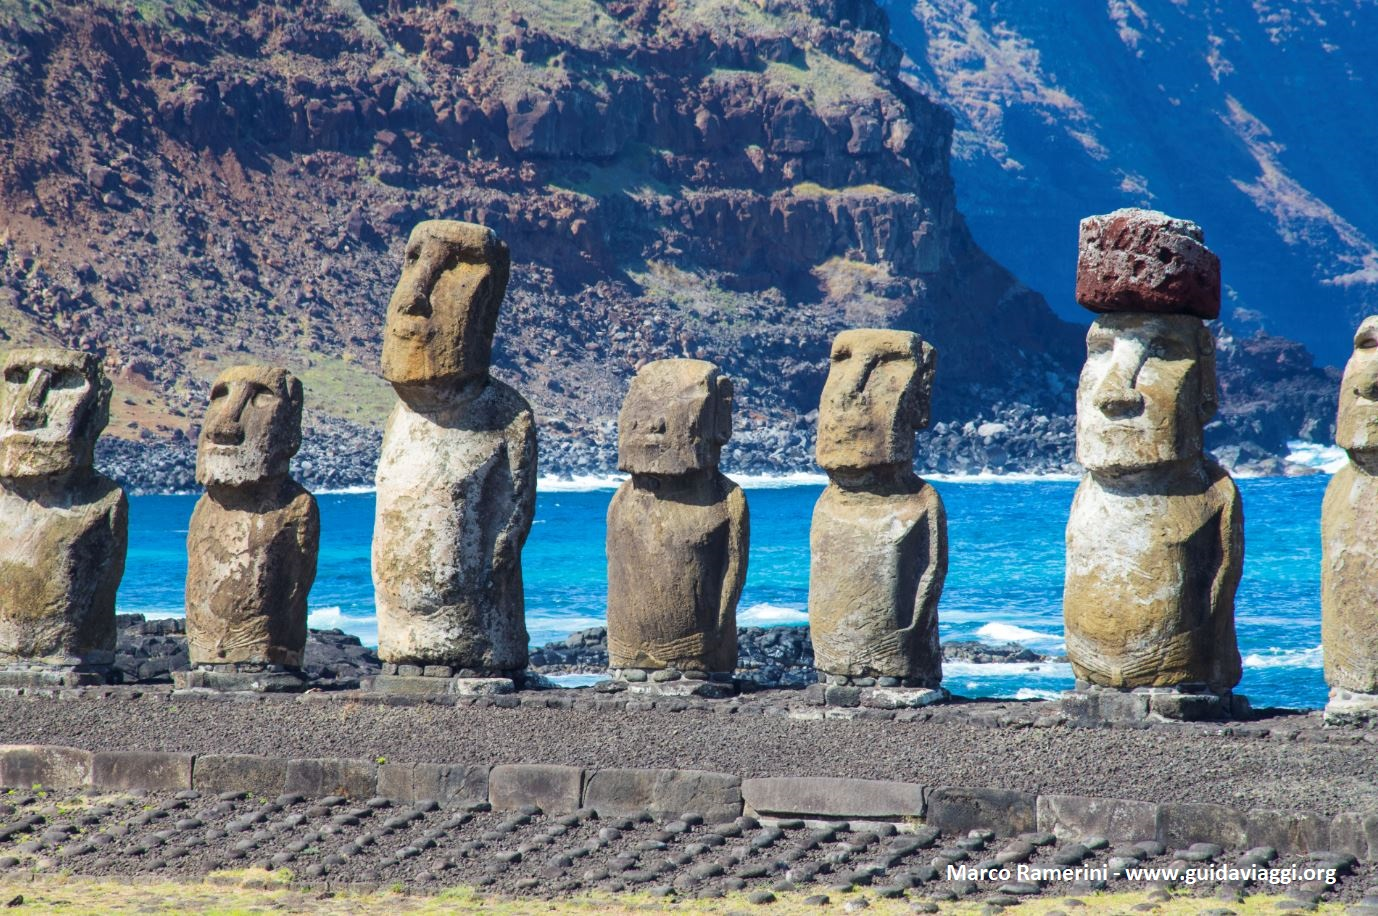 Ahu Tongariki, Ilha de Páscoa, Chile. Autor e Copyright Marco Ramerini